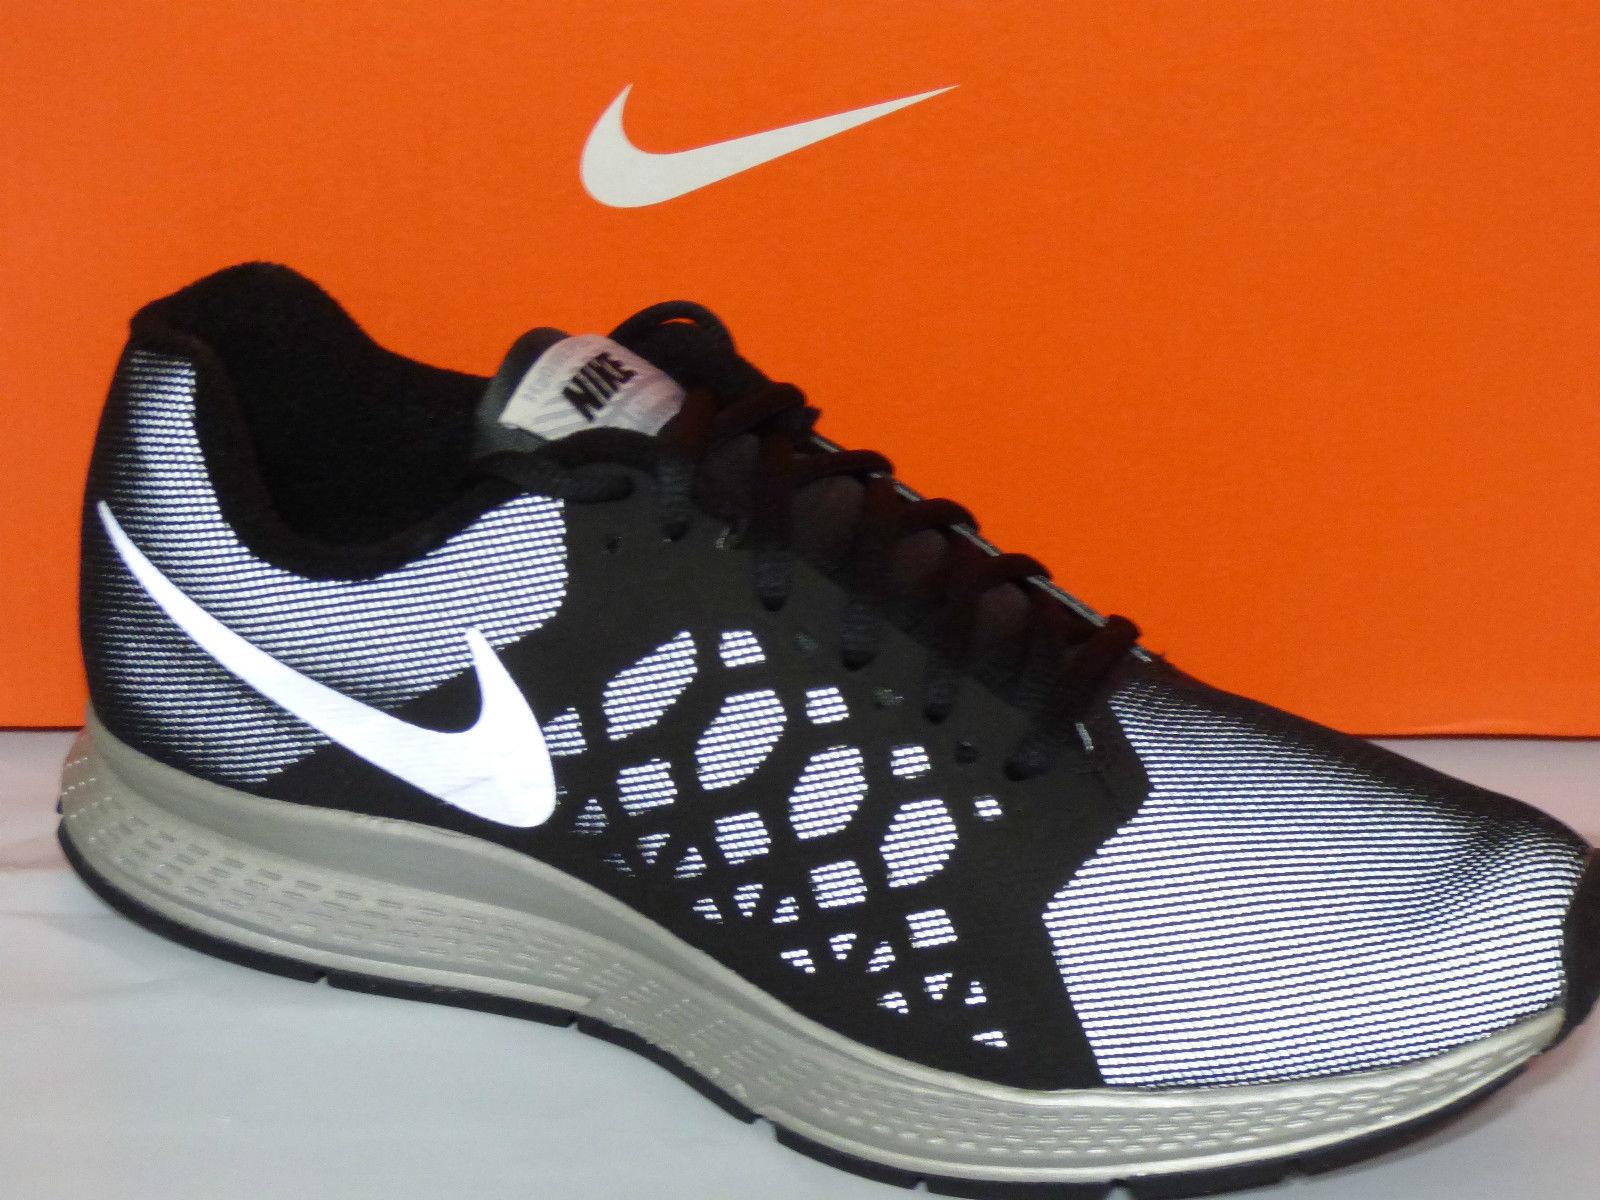 3df7f5390508e Nike Zoom Pegasus 31 Flash Men s Running and 50 similar items. S l1600